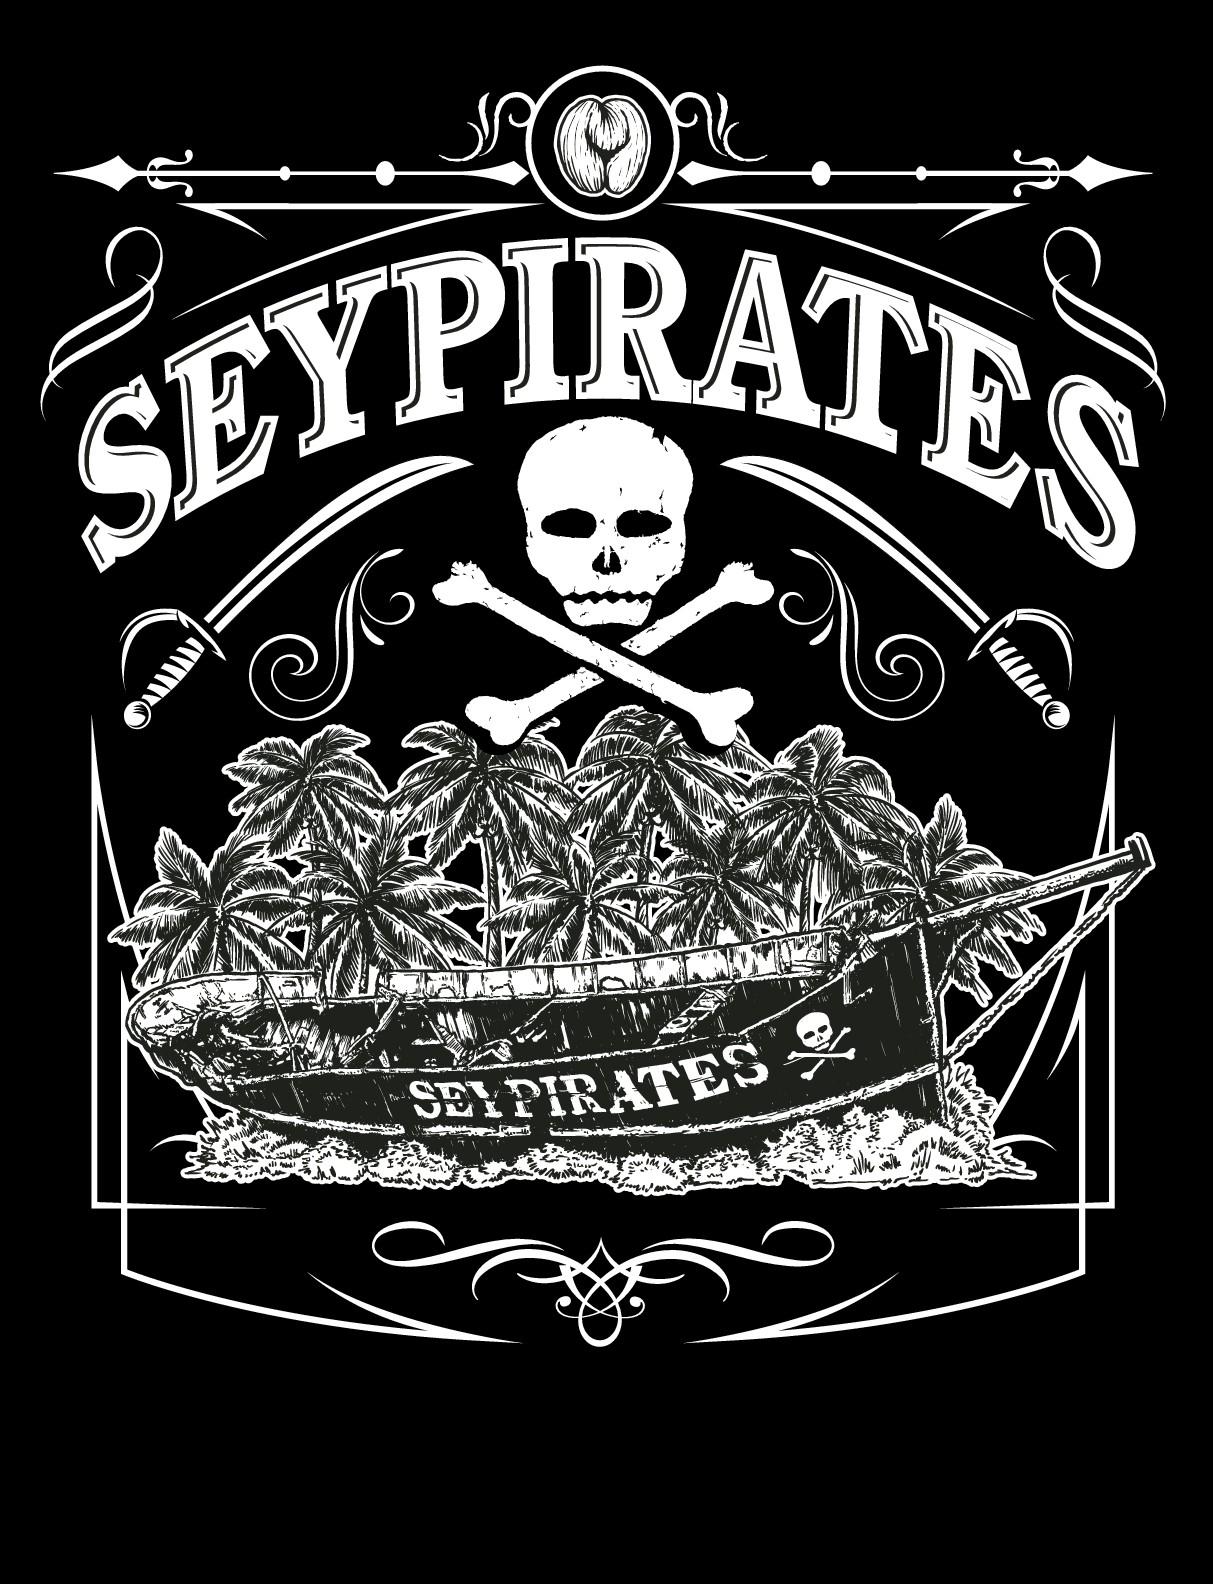 Seypirates